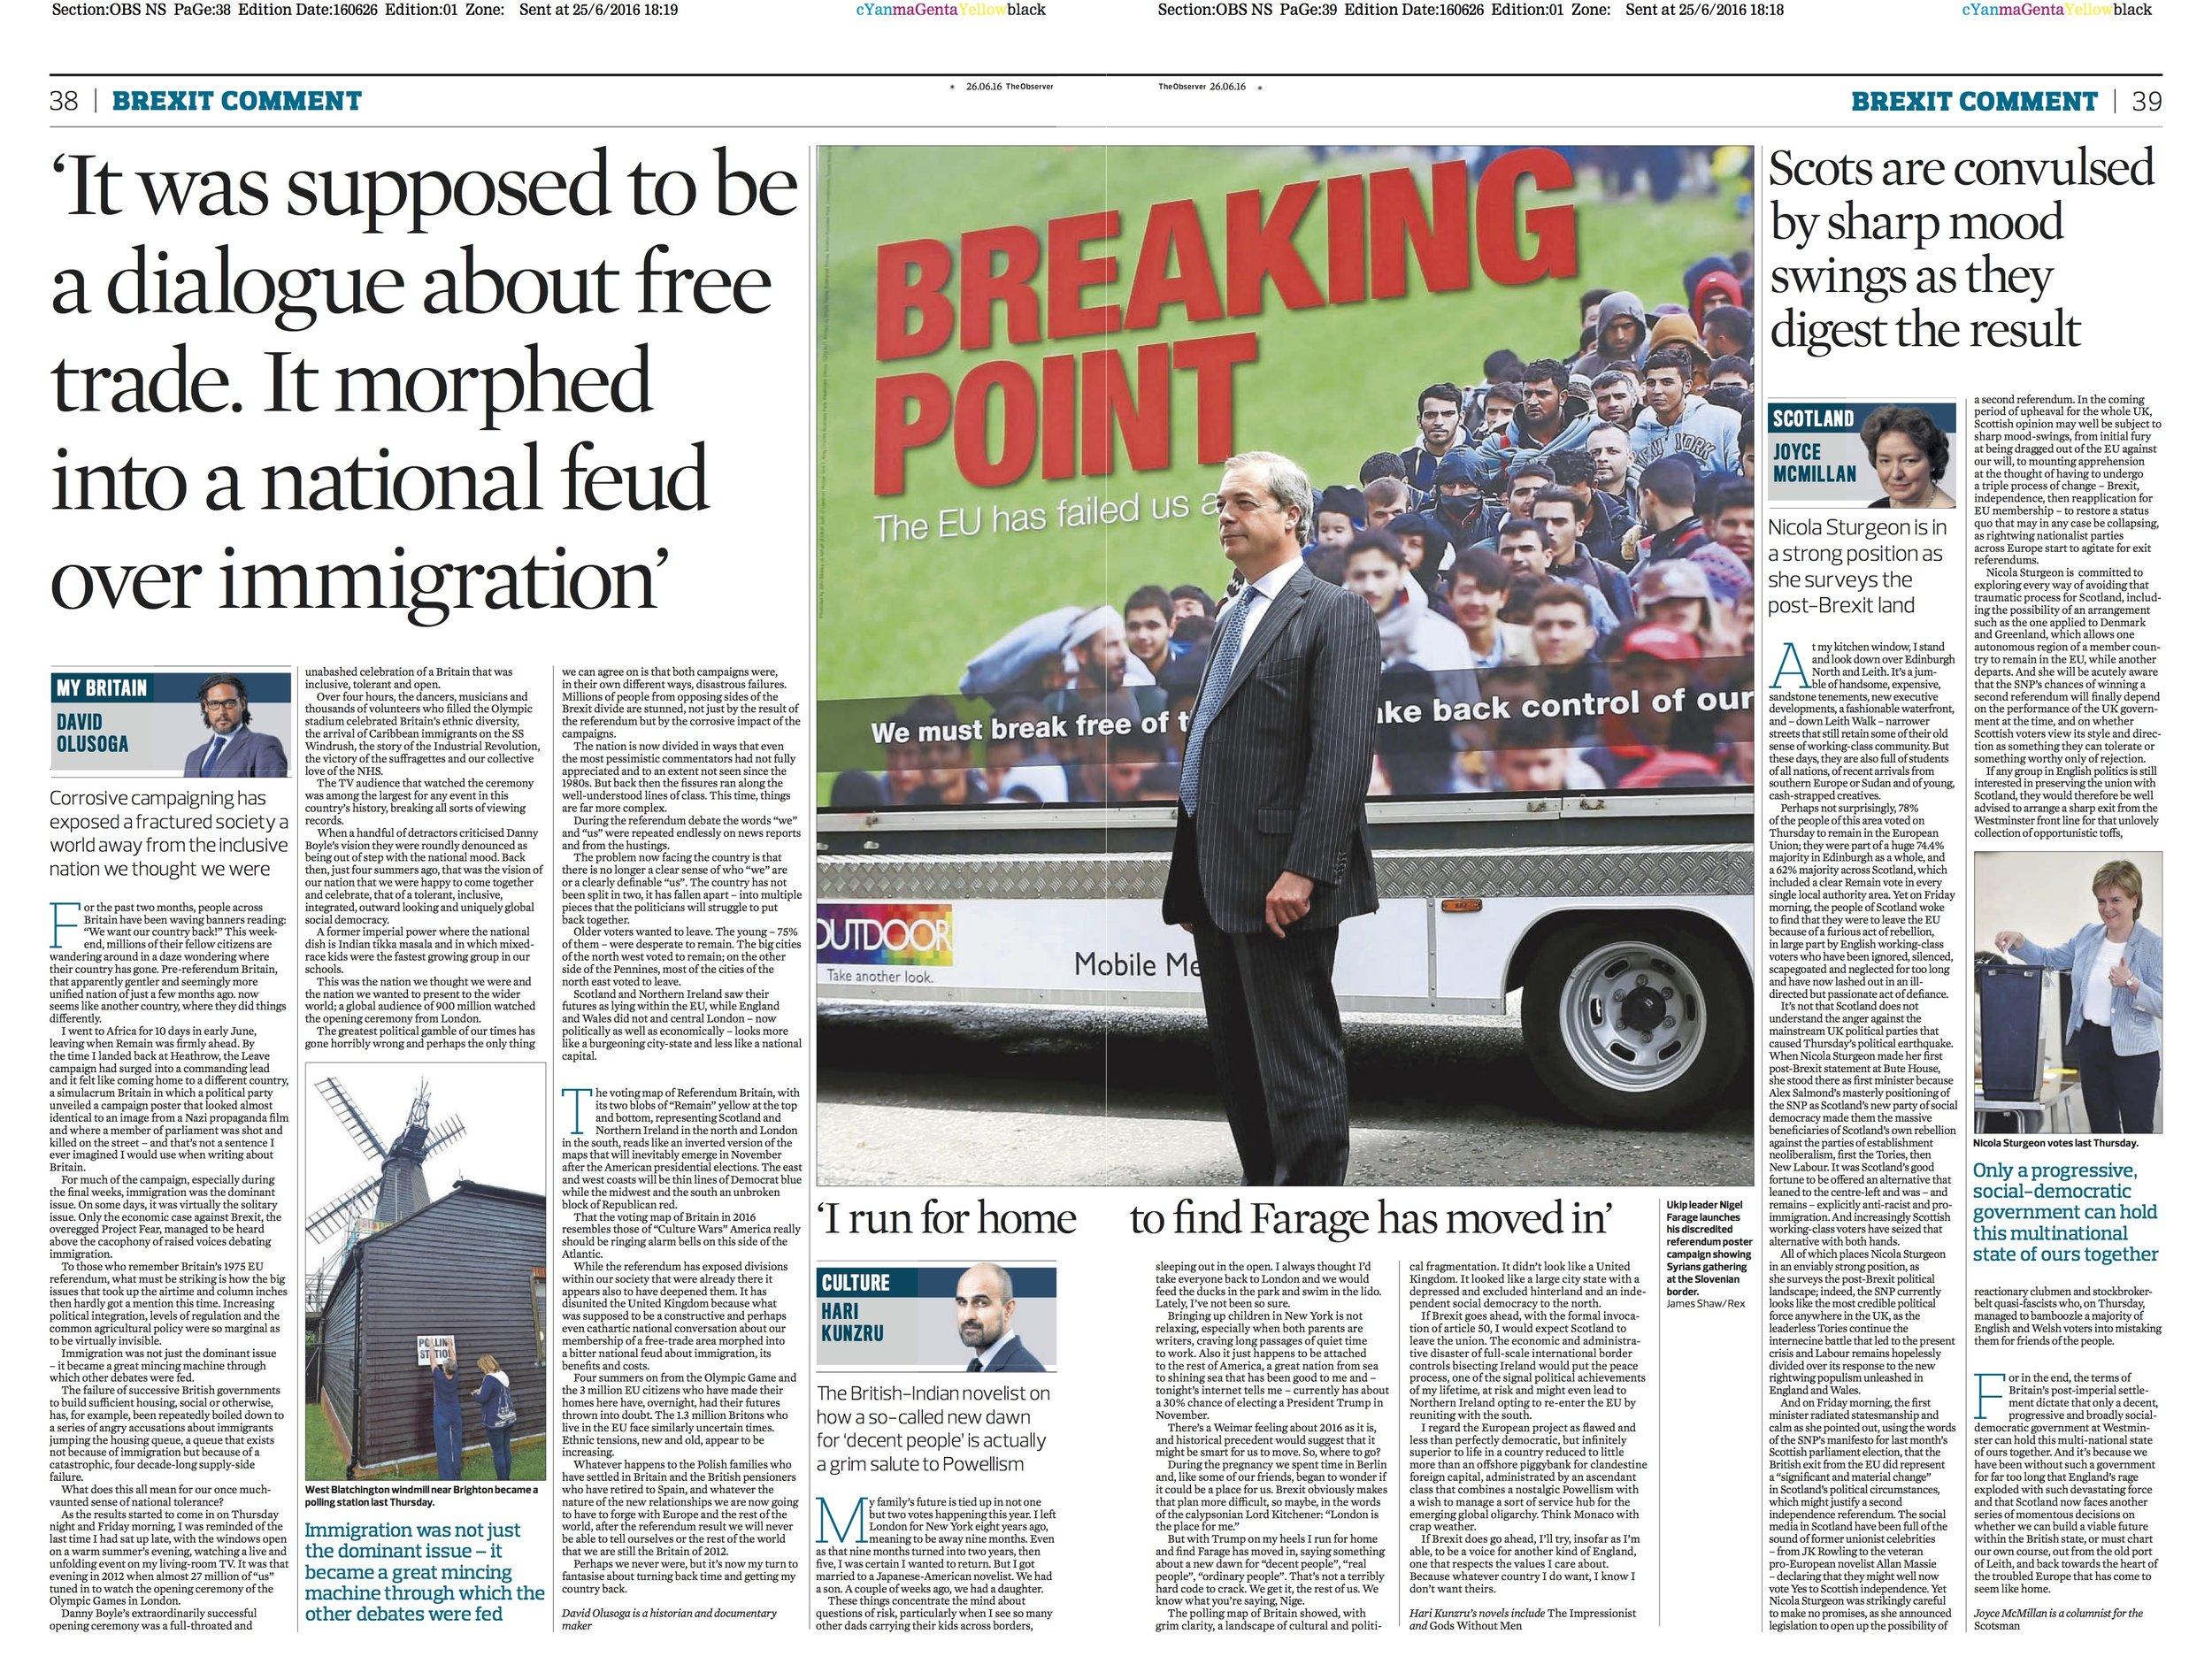 Nigel farage The Observer.jpg